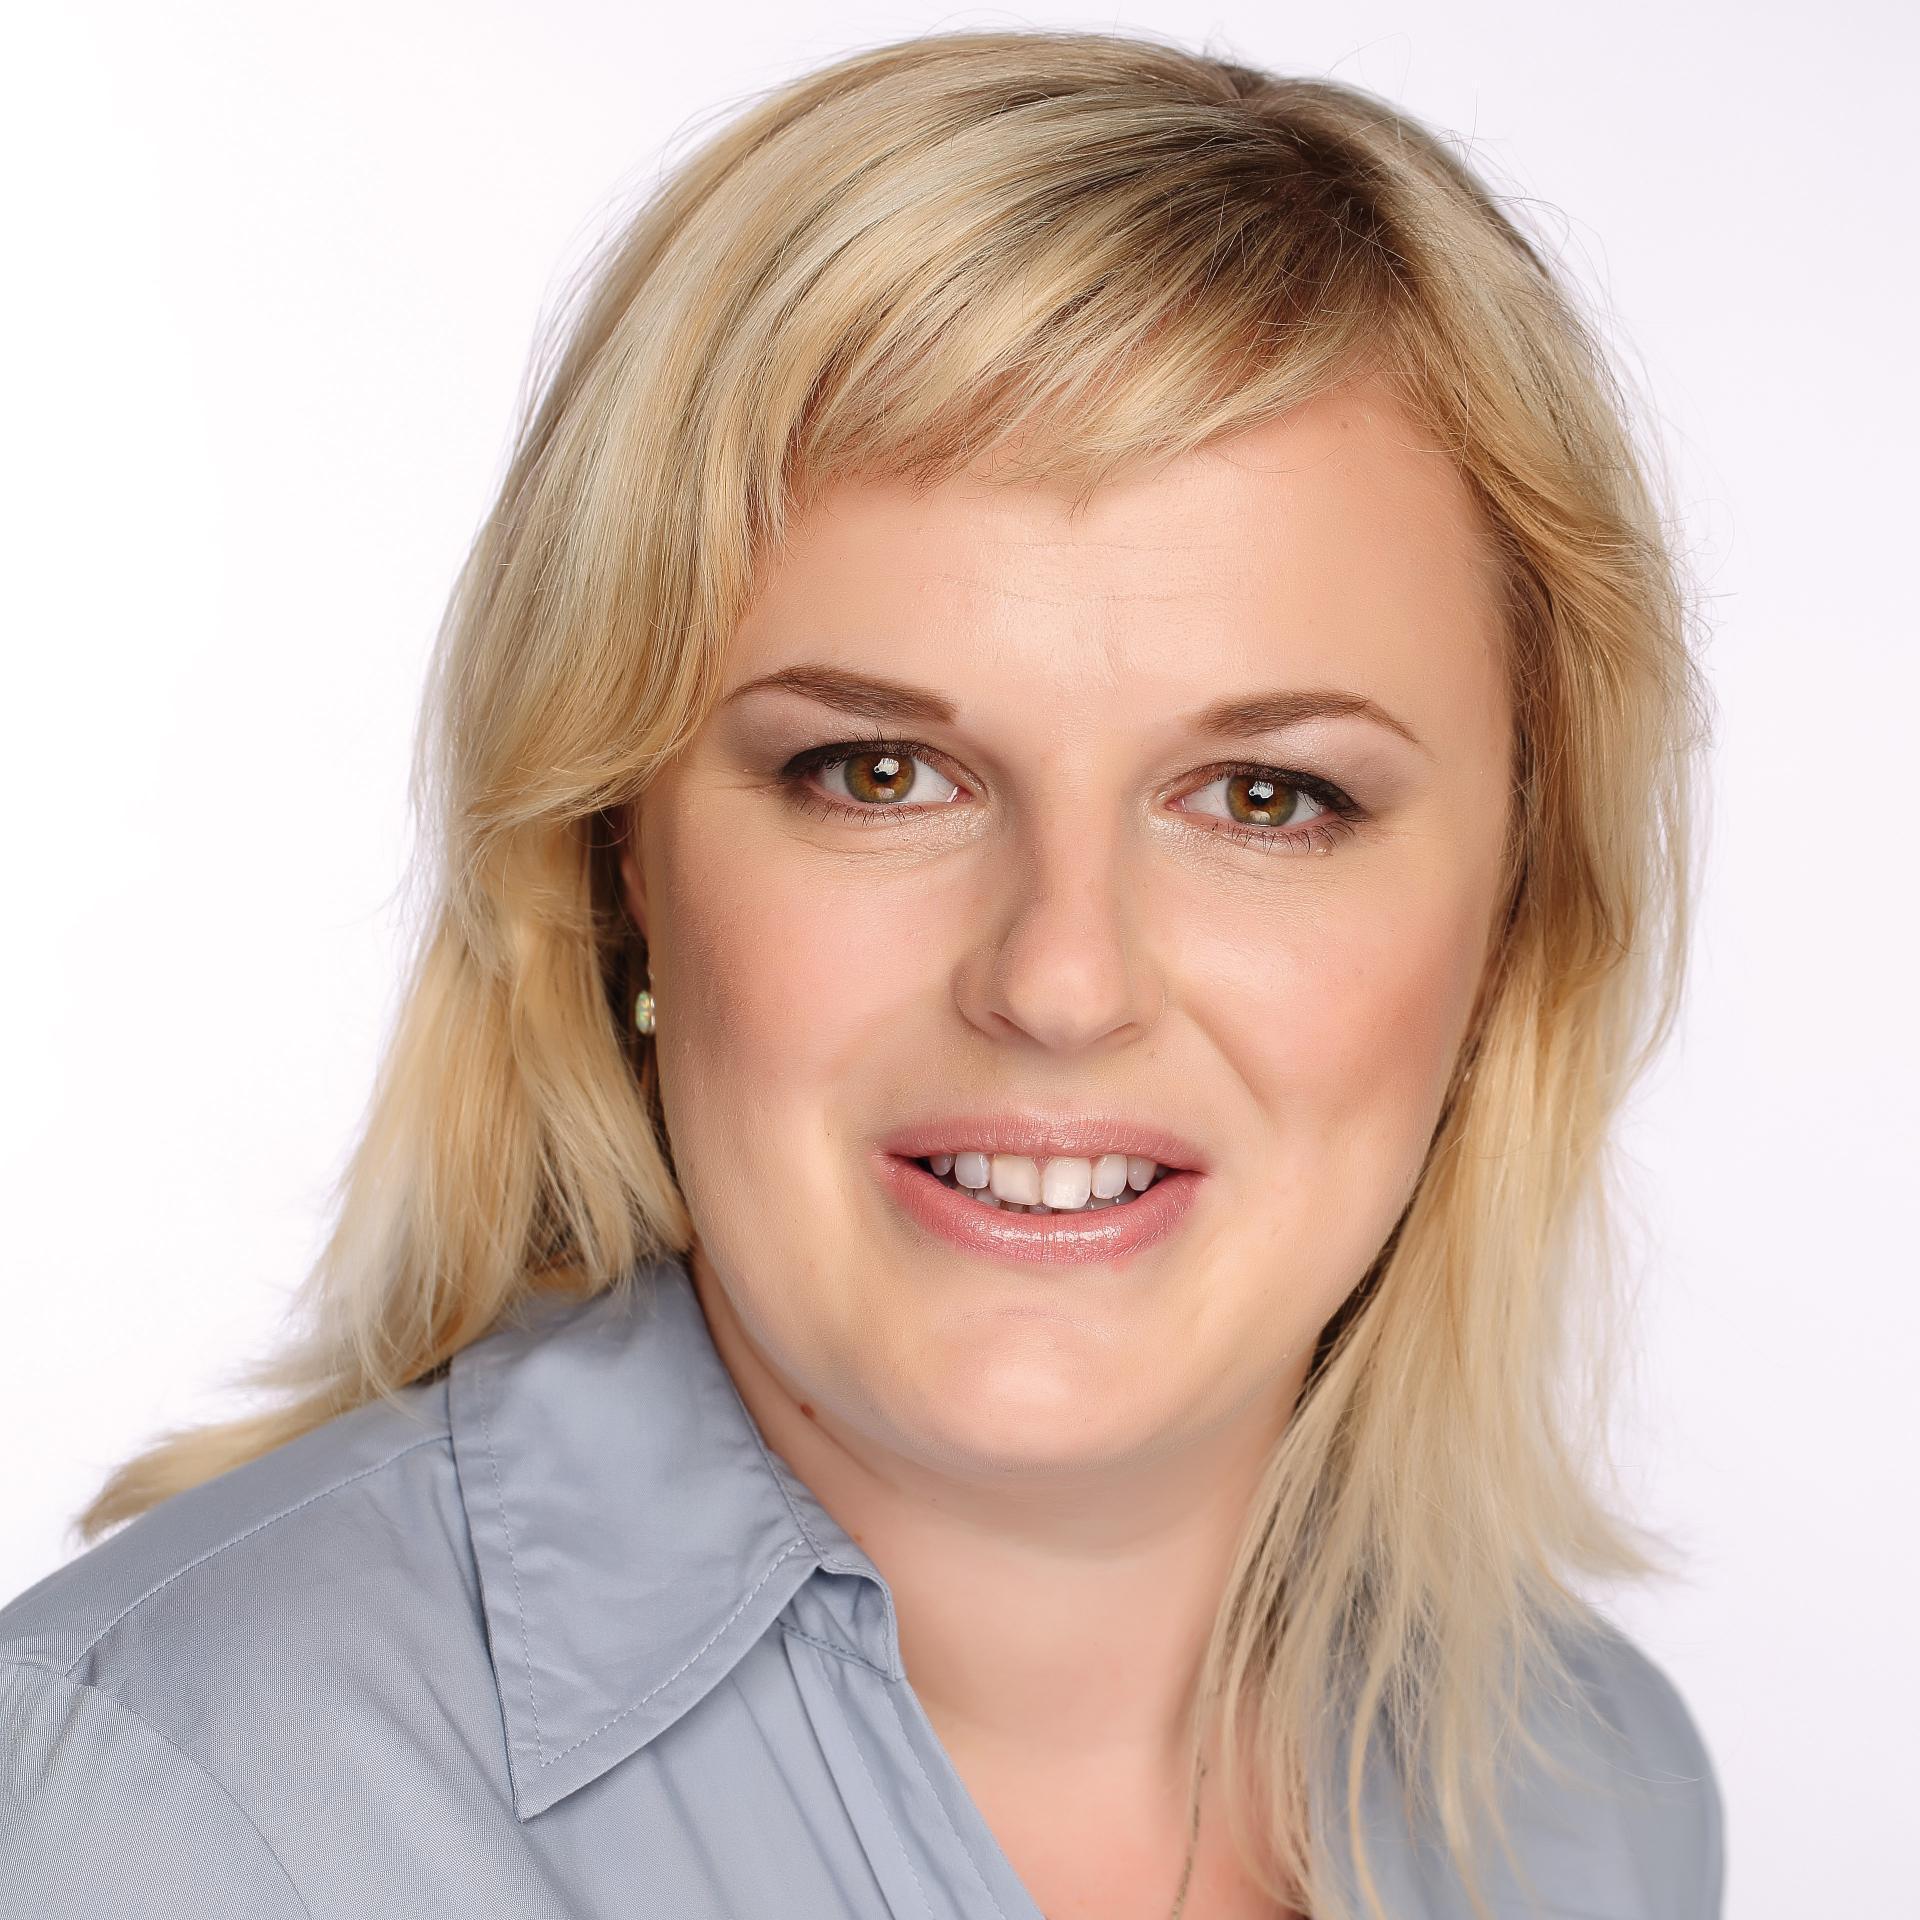 Adela Konopkova